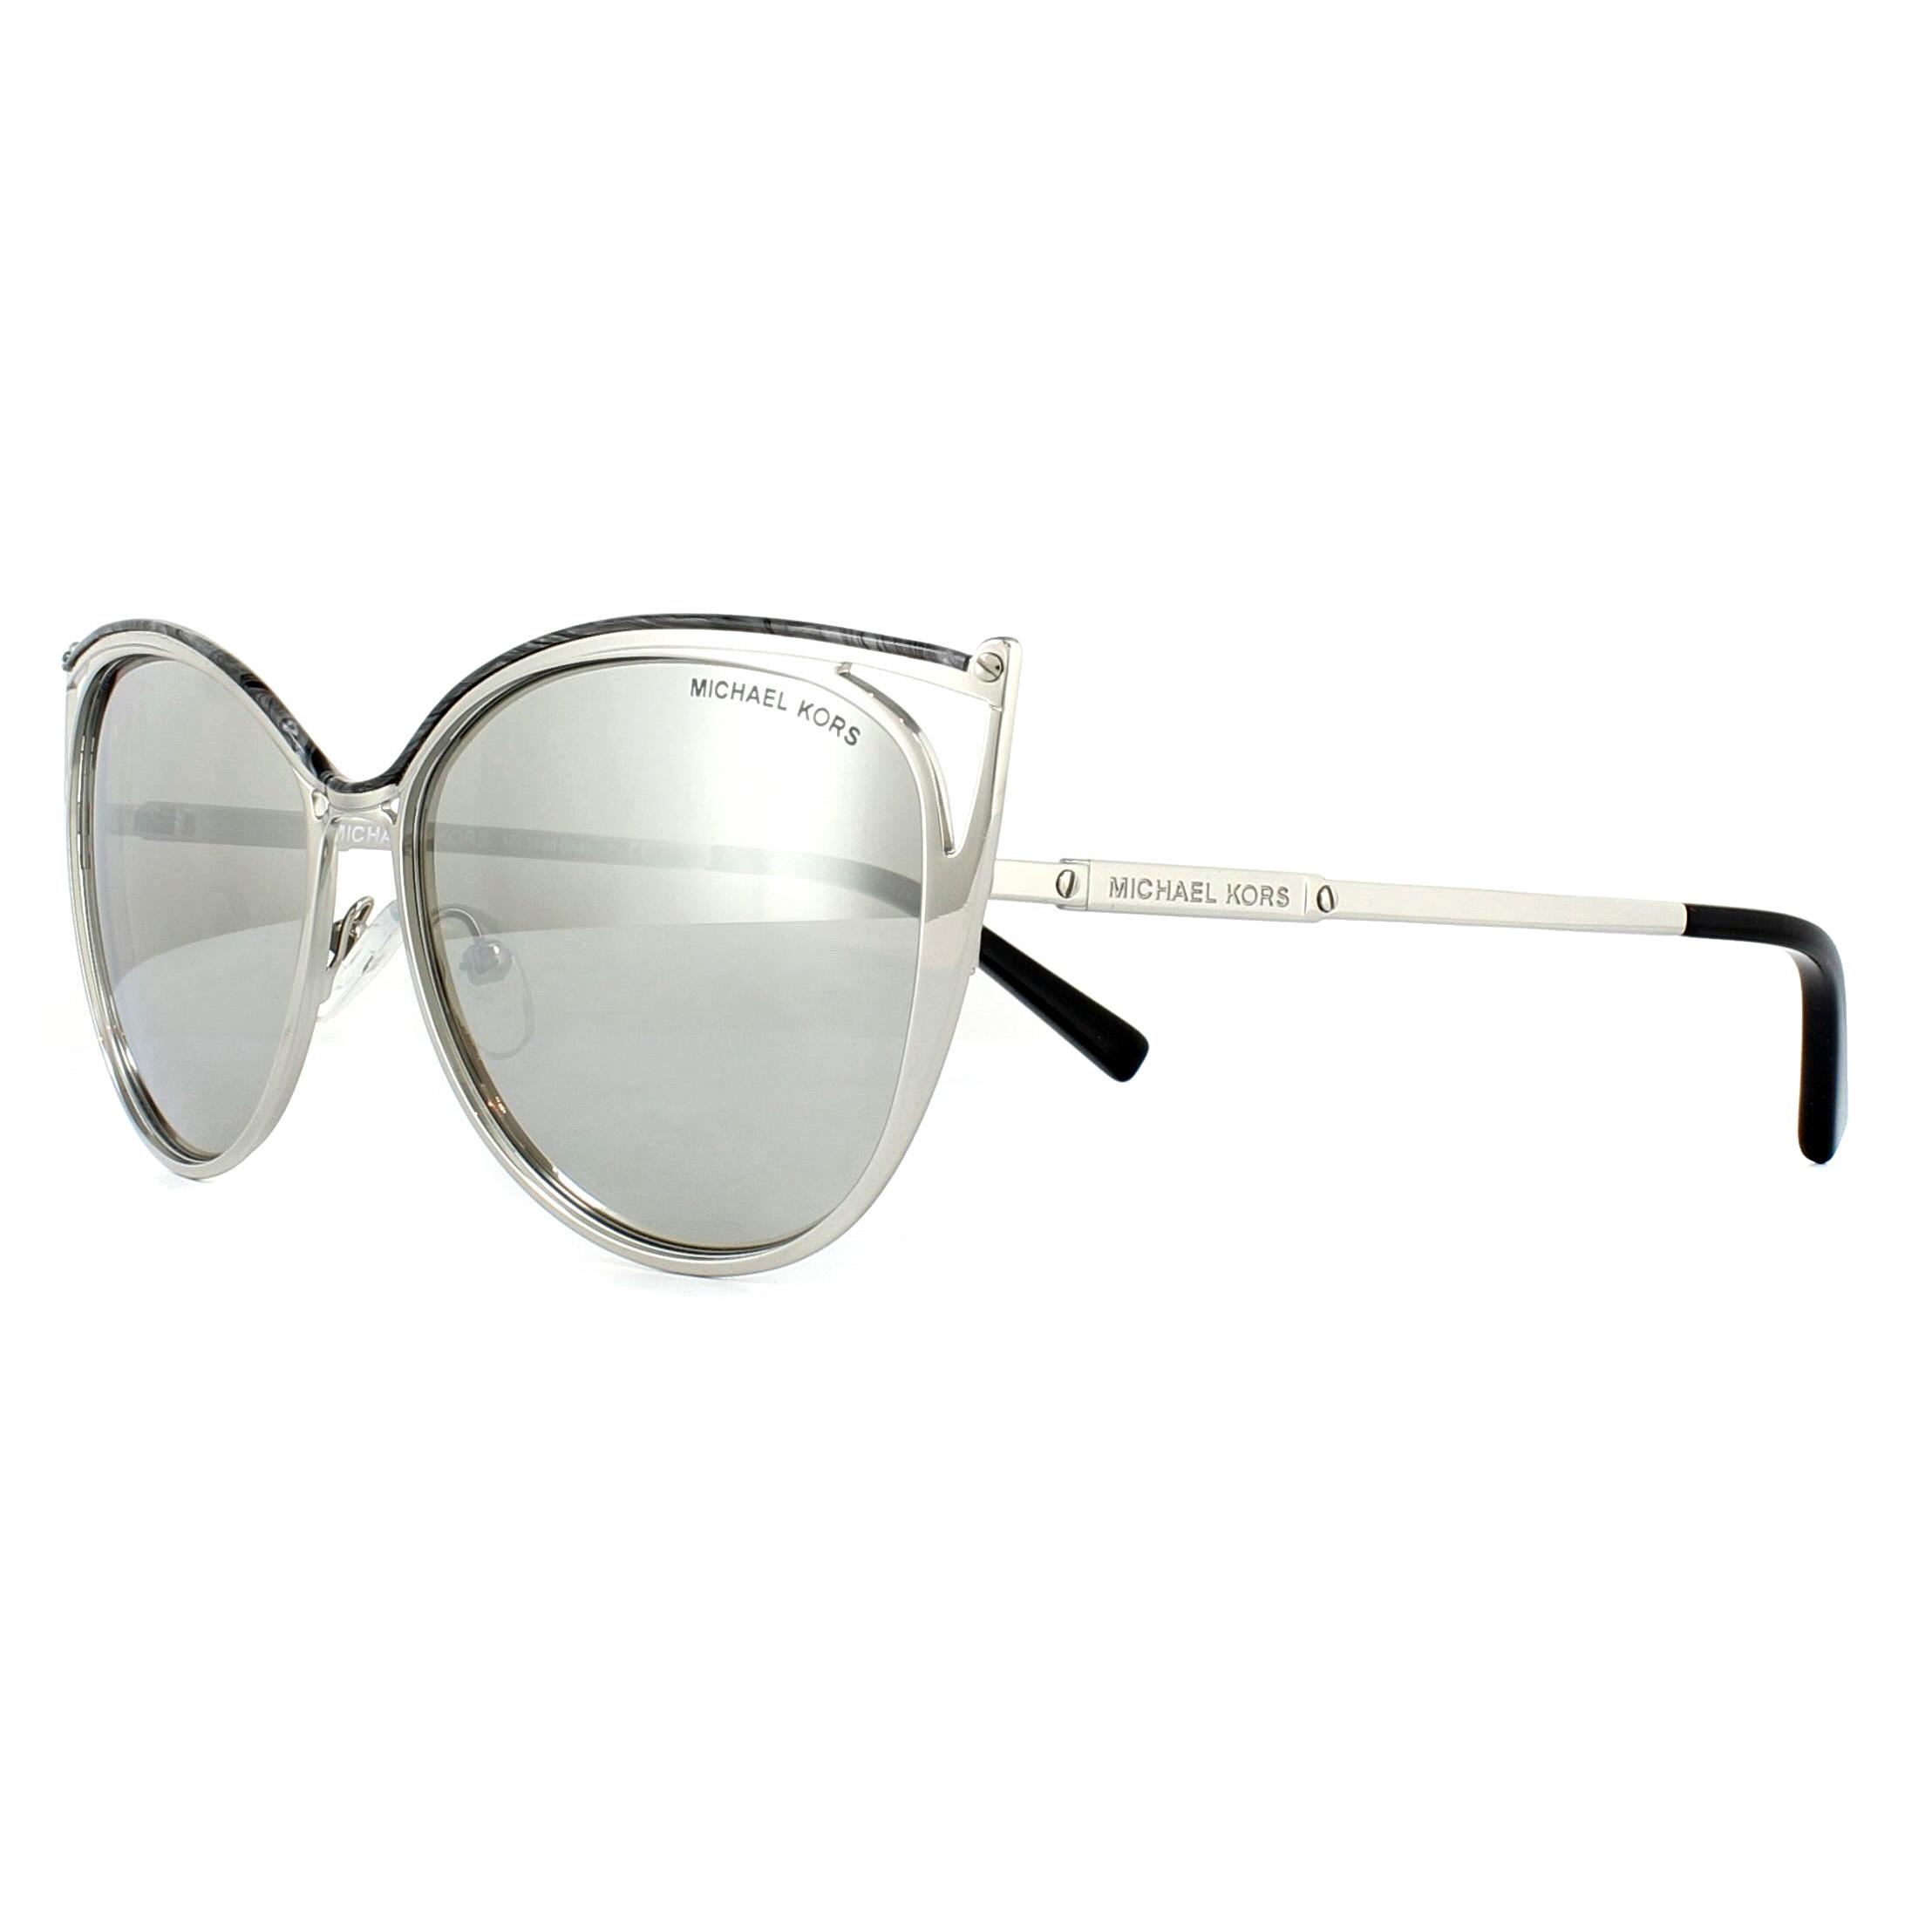 1b4f325818 Sentinel Michael Kors Sunglasses Ina 1020 11666G Silver Silver Mirror.  Sentinel Thumbnail 2